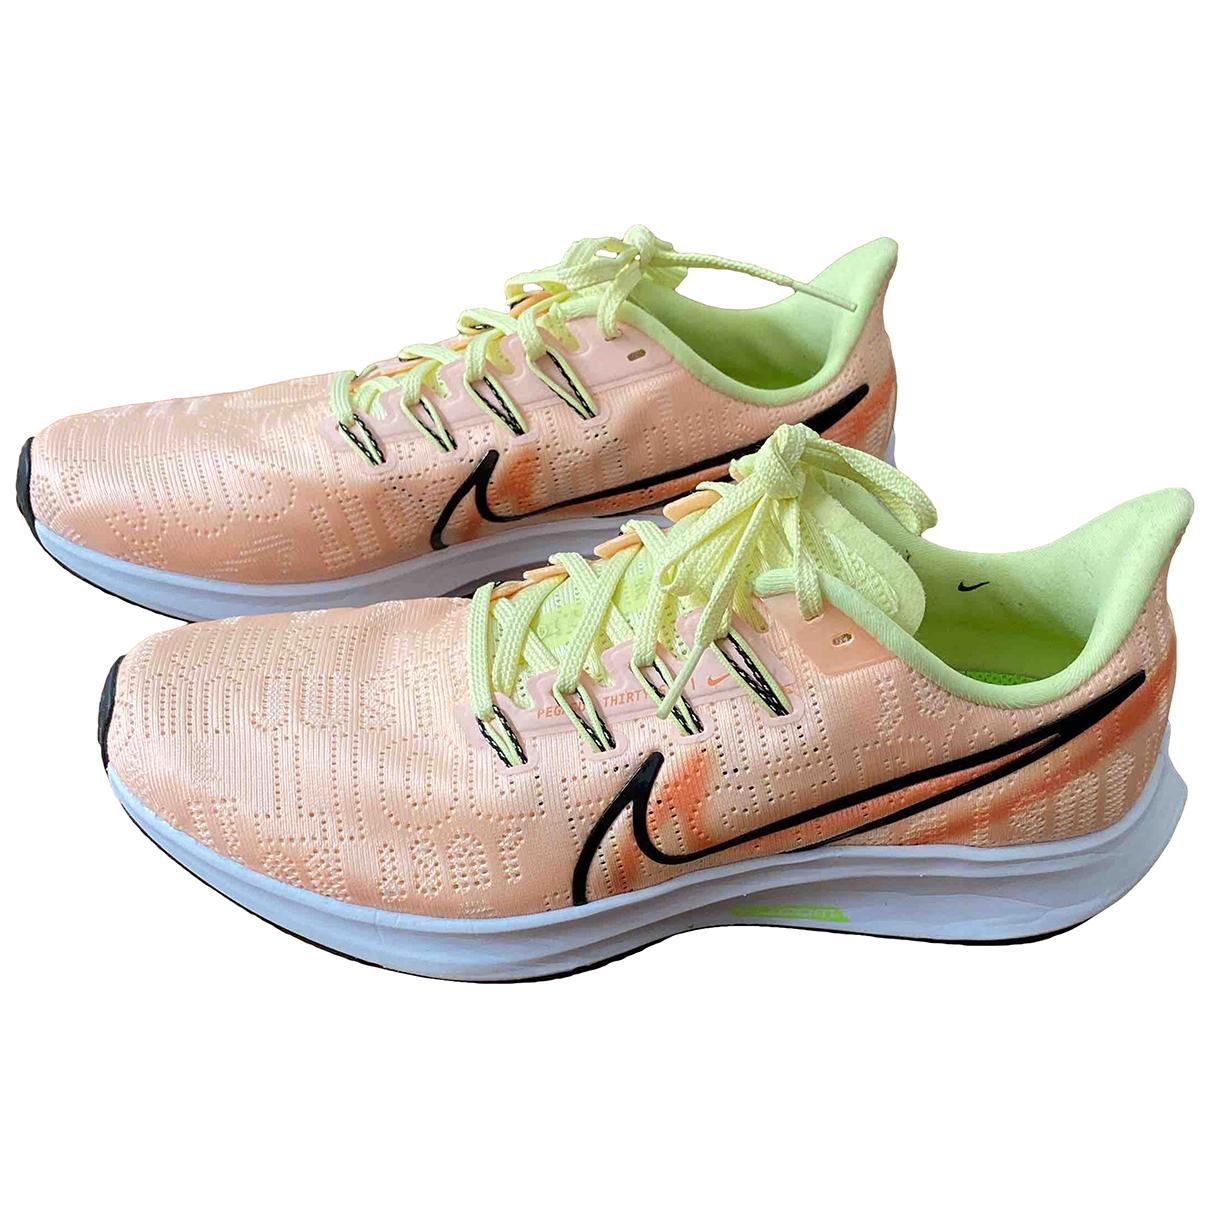 Nike Zoom Pink Cloth Trainers for Women 40 EU